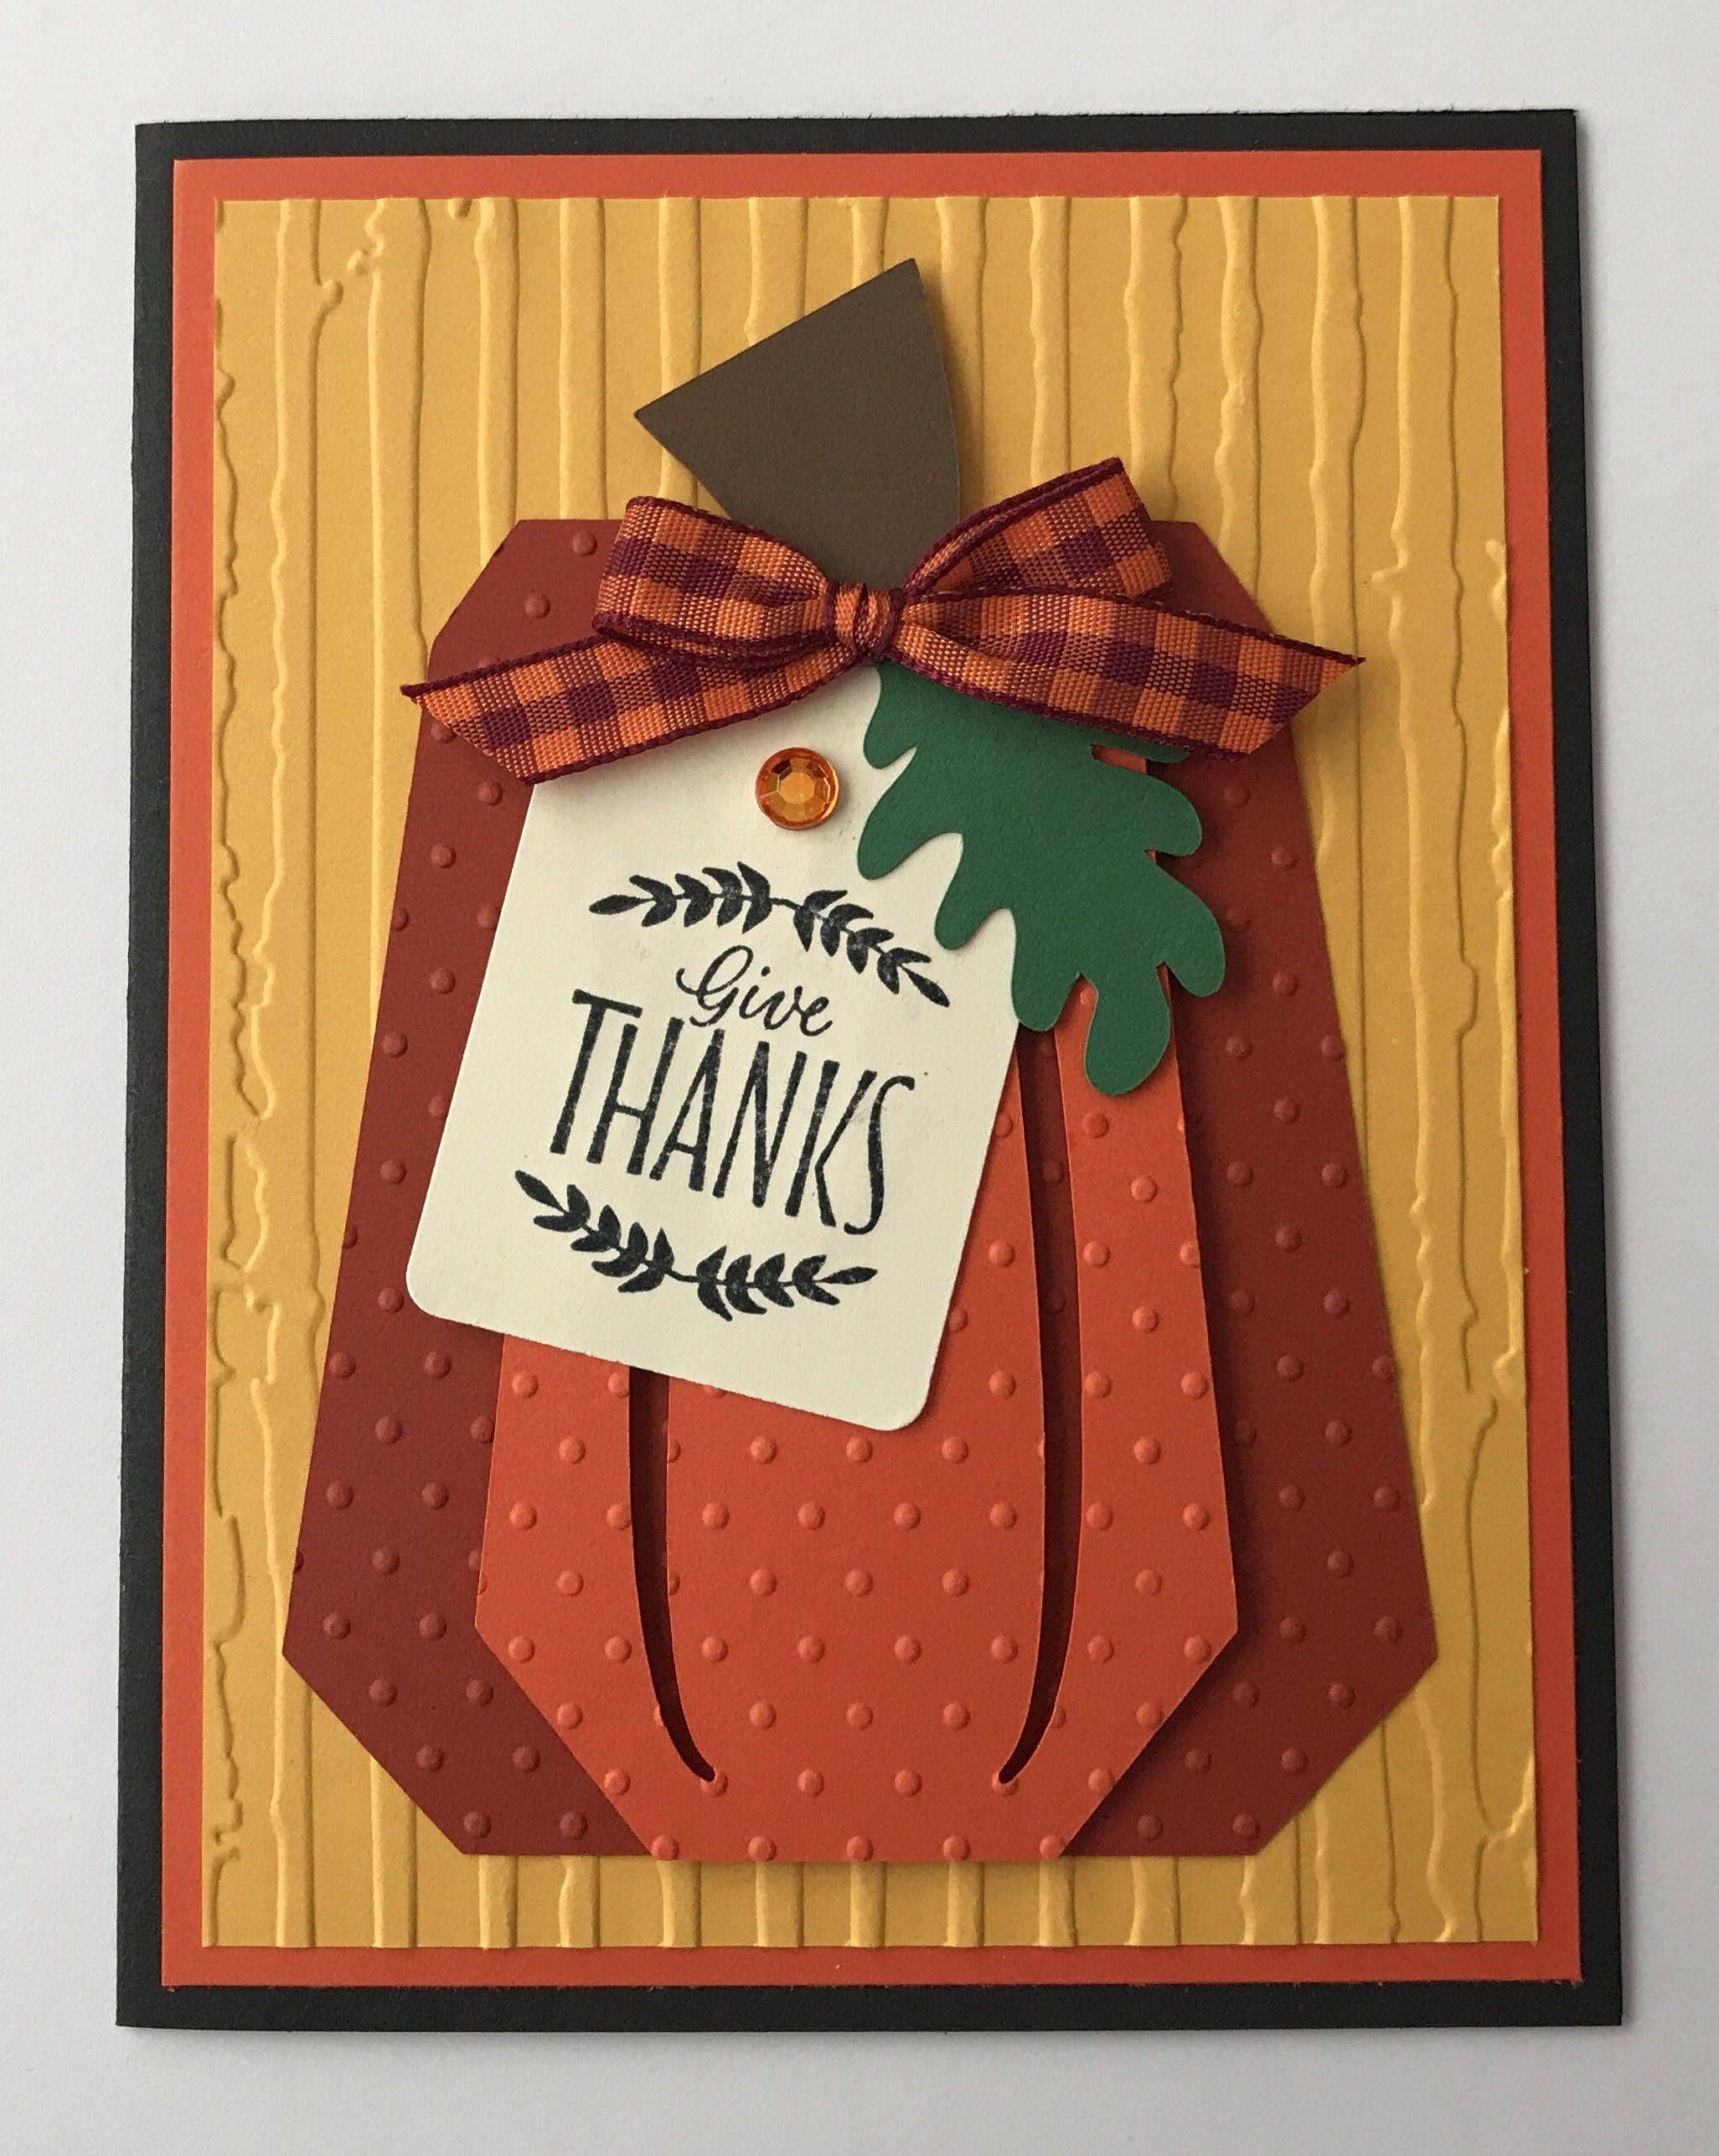 Handmade Thanksgiving Card Harvest Pumpkin Thanksgiving Thankful